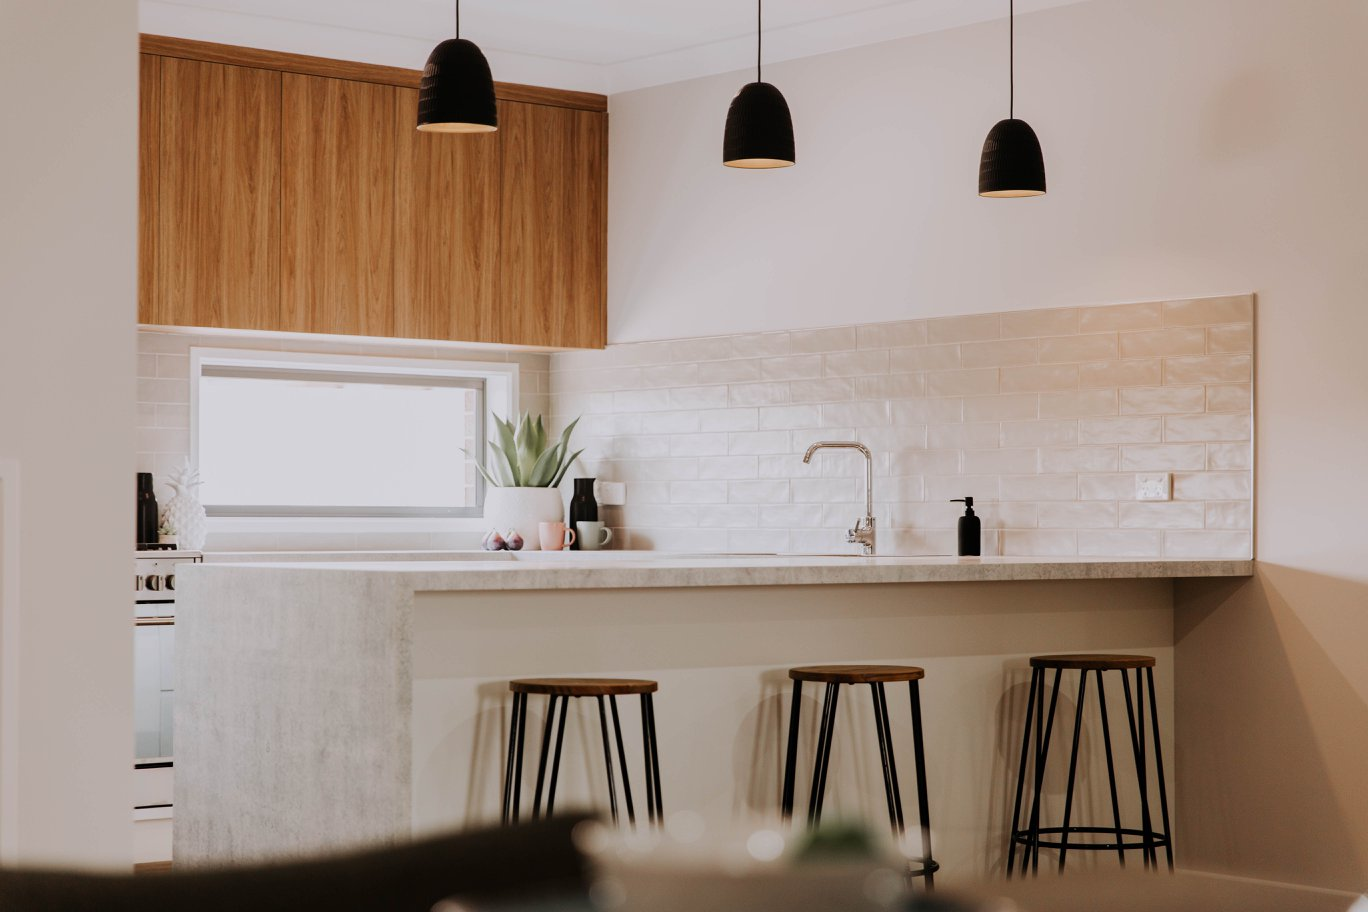 015 Alatalo Bros - kitchen design - kitchen cabinets - local builder - flair cabinets kitchens - interior design - colour consulting - builders - home design - modern homes - modern kitchen - kitchen cabinets - kitchen lights - kitchen island - kitchen designer